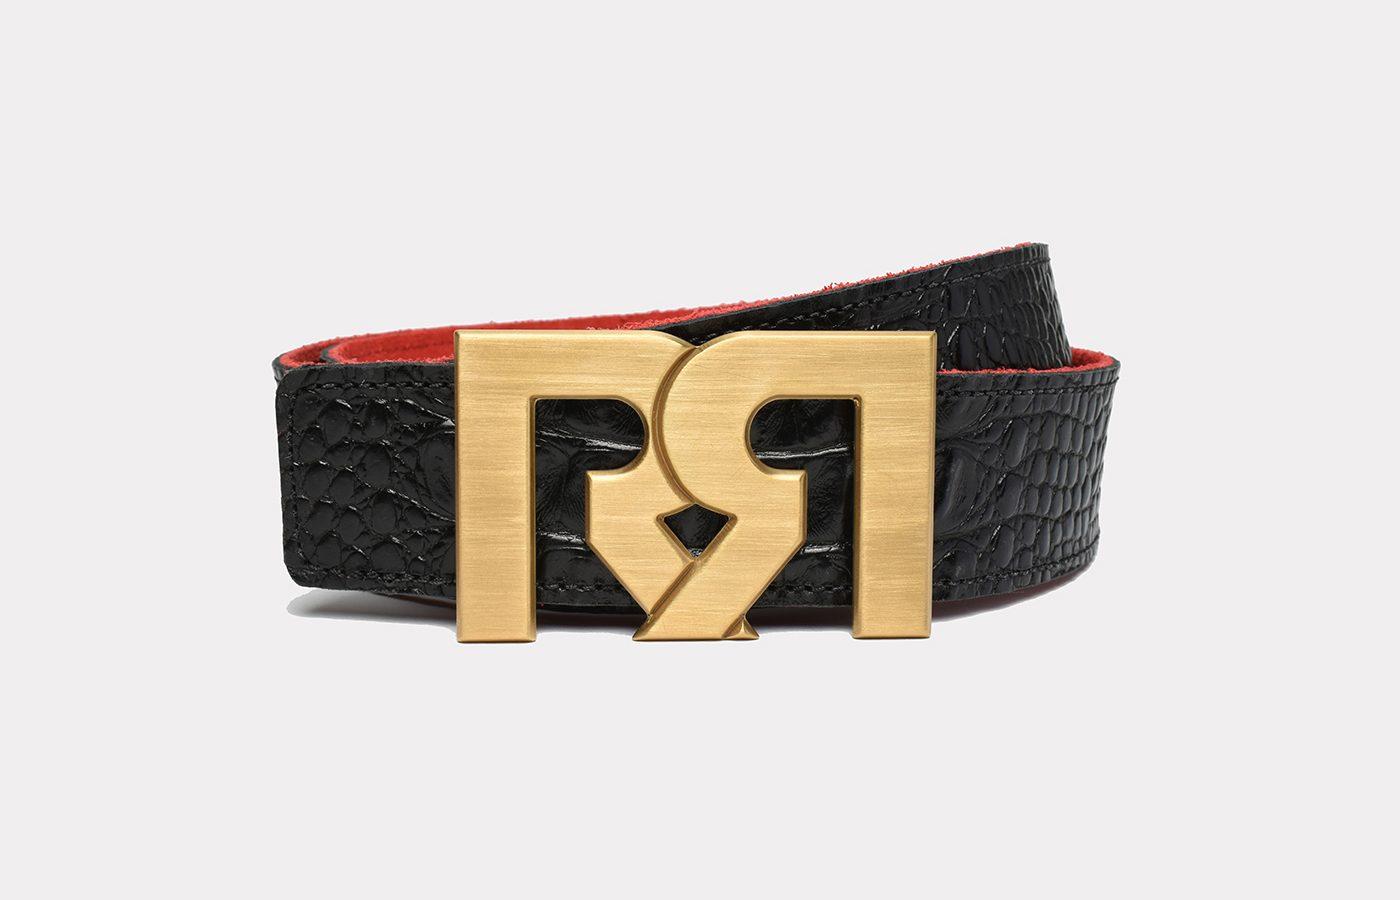 RR Designer belts Brushed 24k Gold plated with Croc Embossed Leather strap